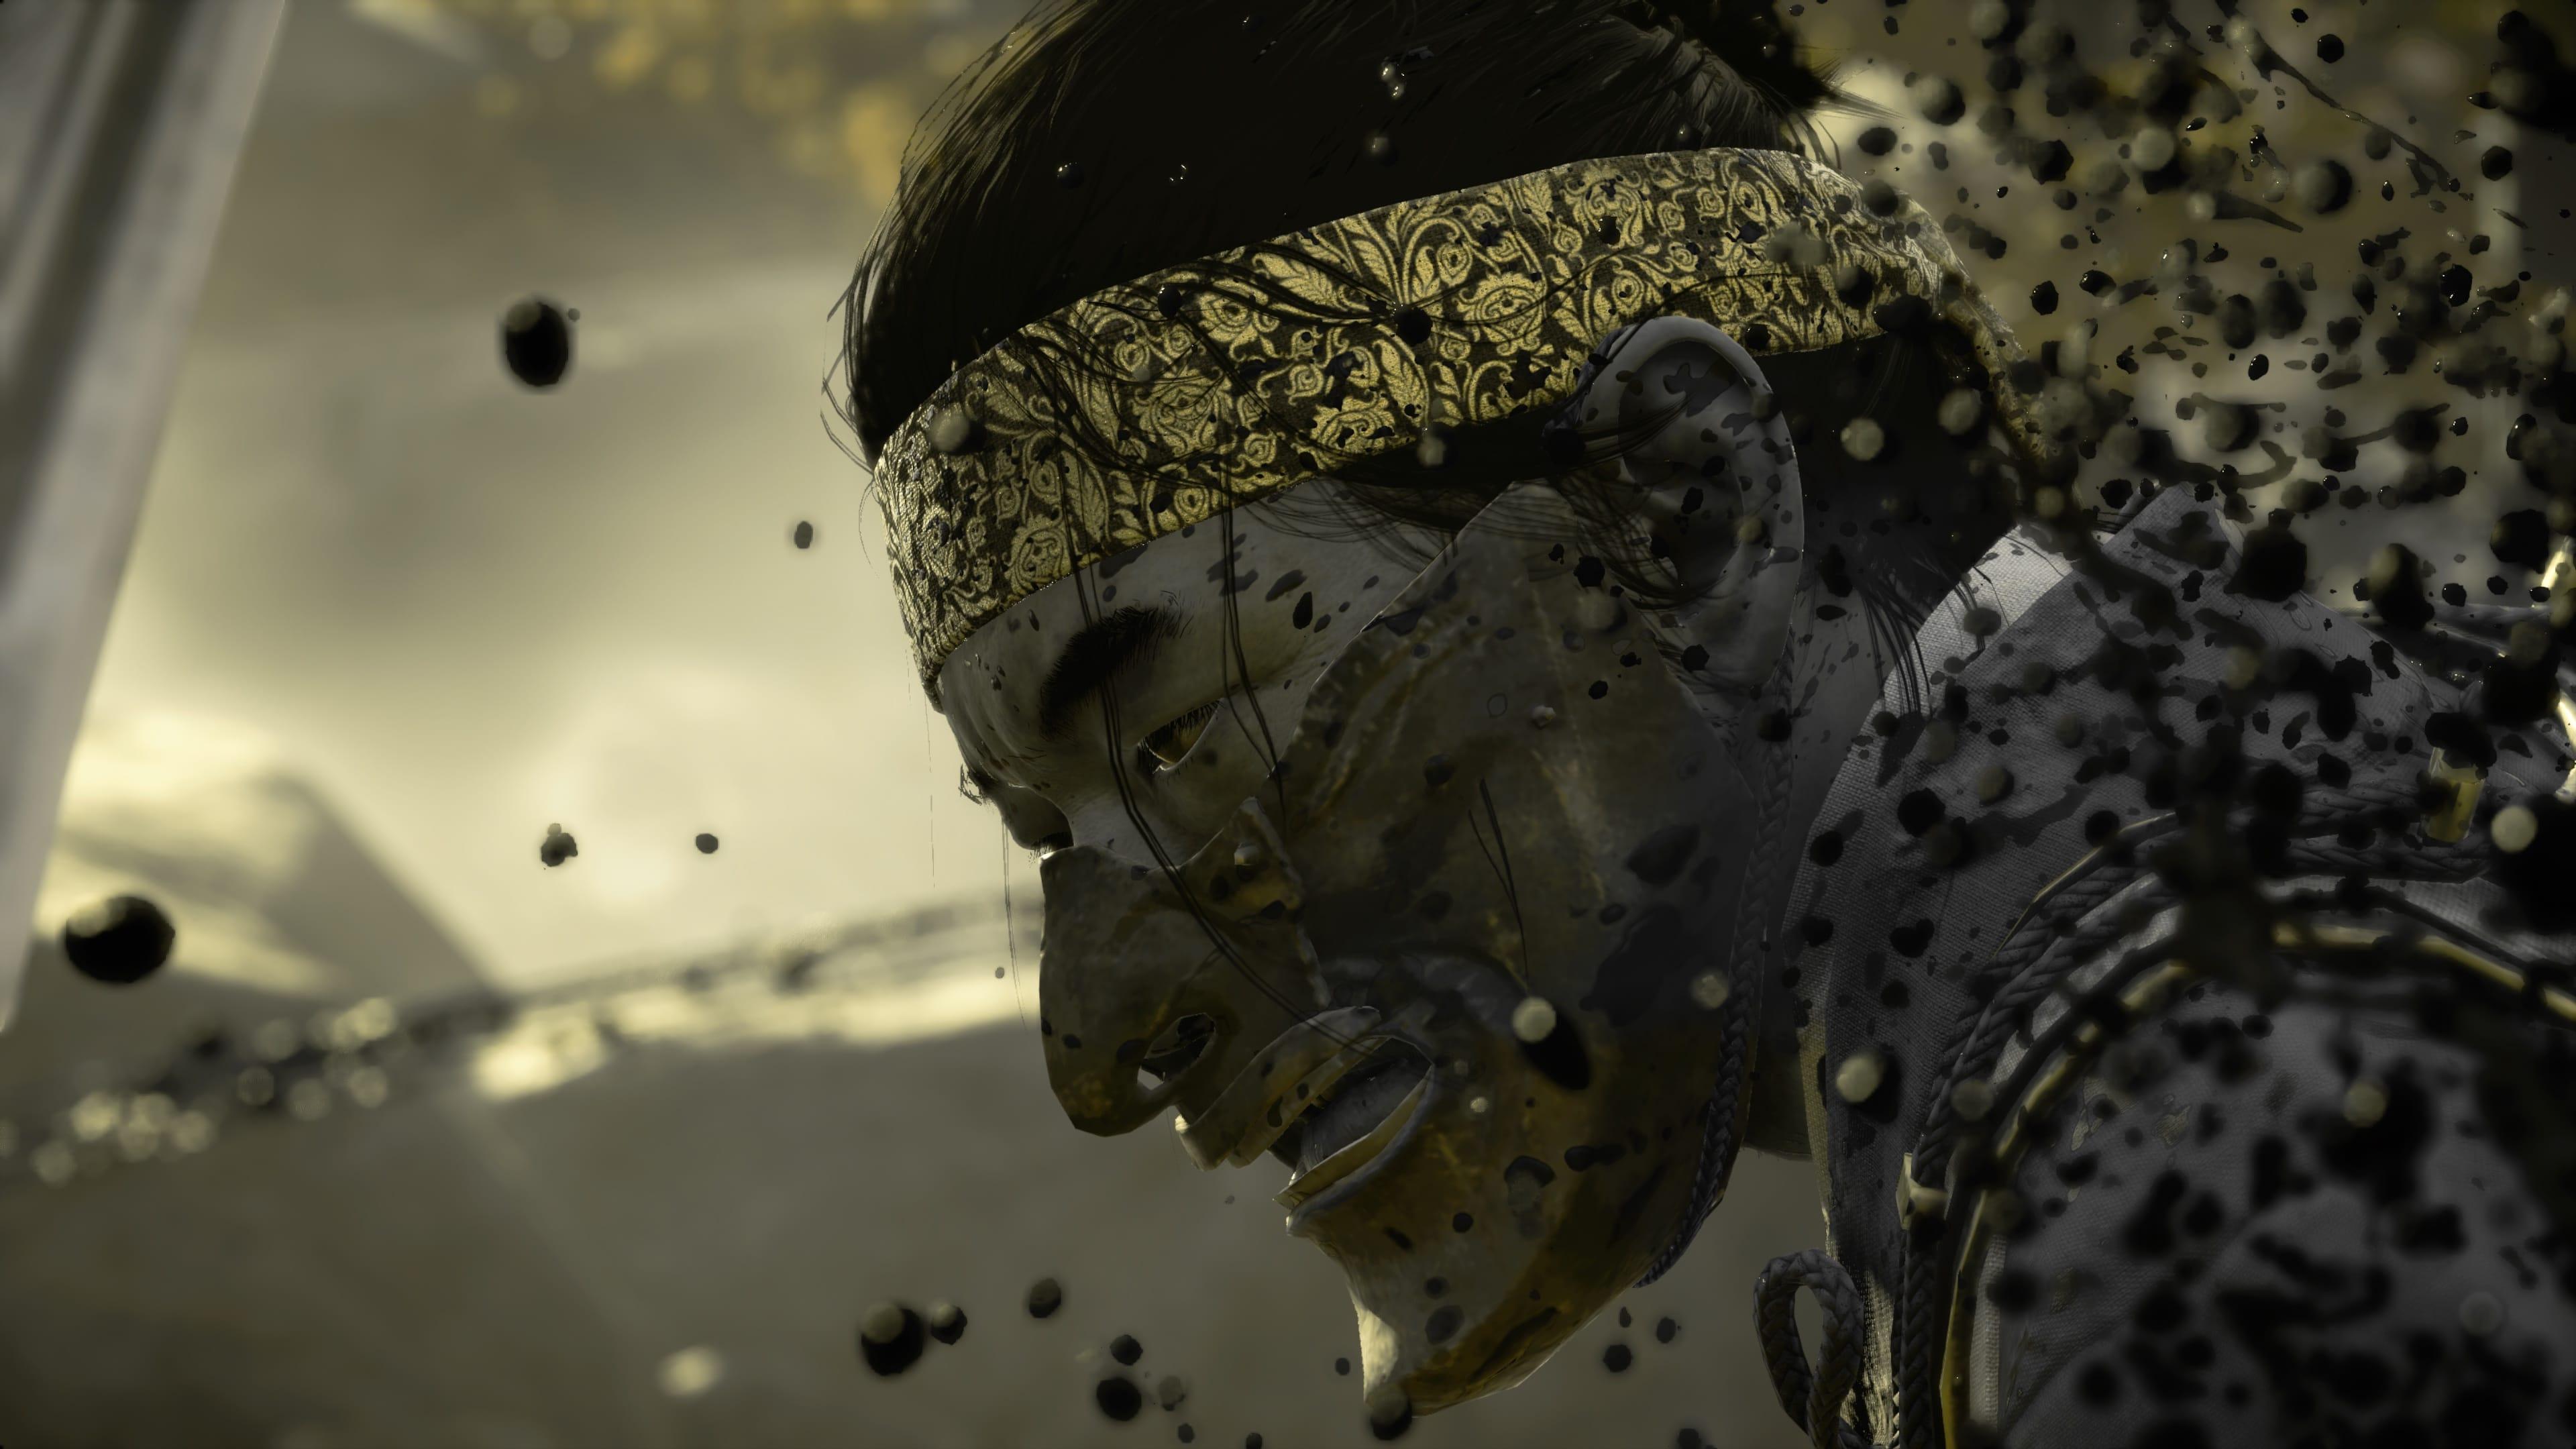 Screenshot 4K Ghost Of Tsushima 7